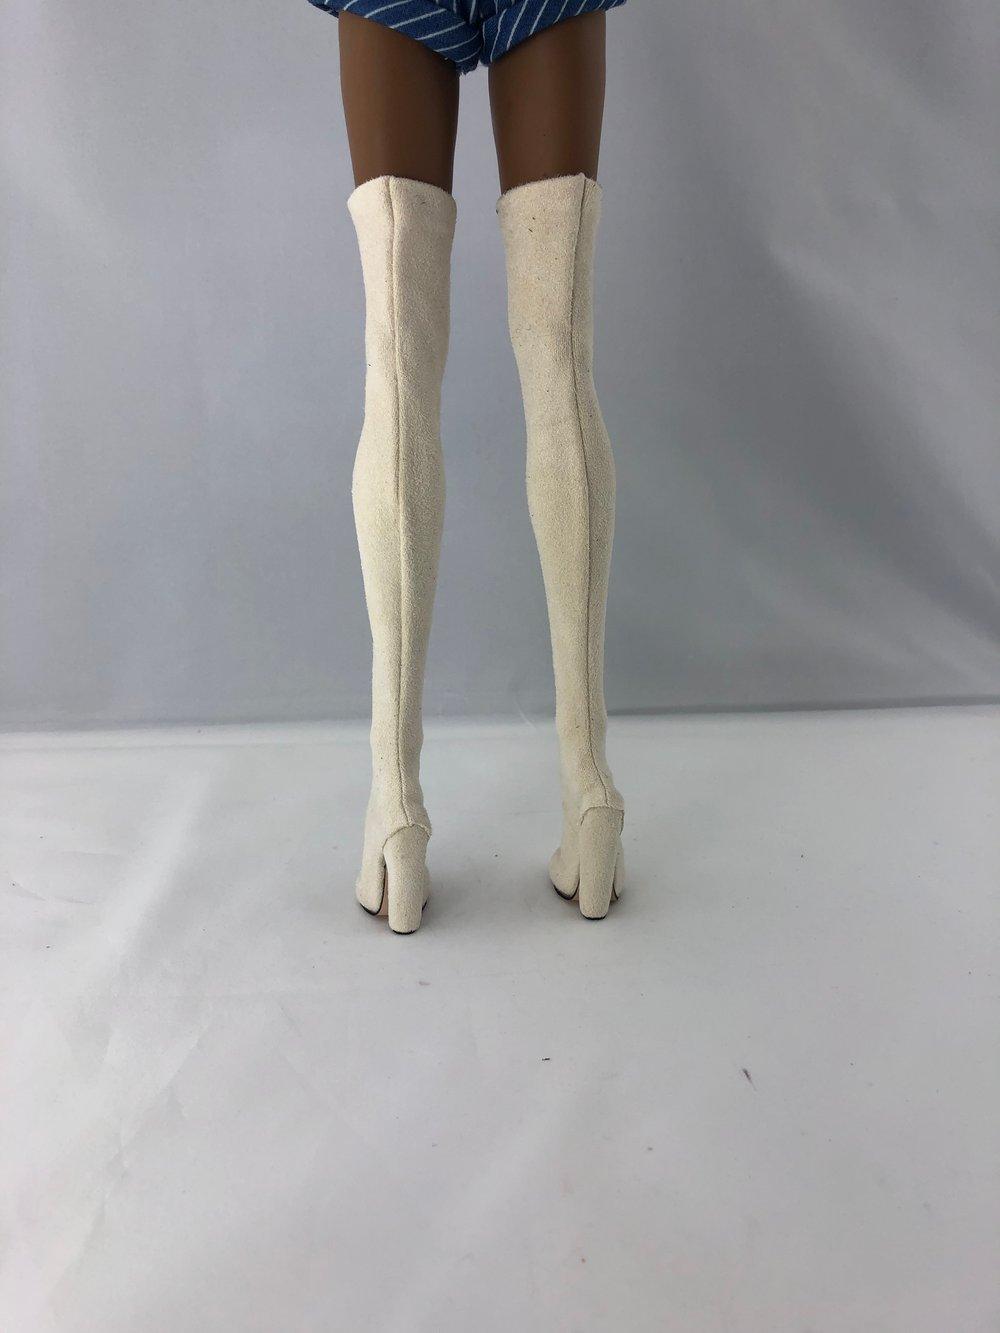 Cream Suede Thigh High Boots: Pidgin Doll